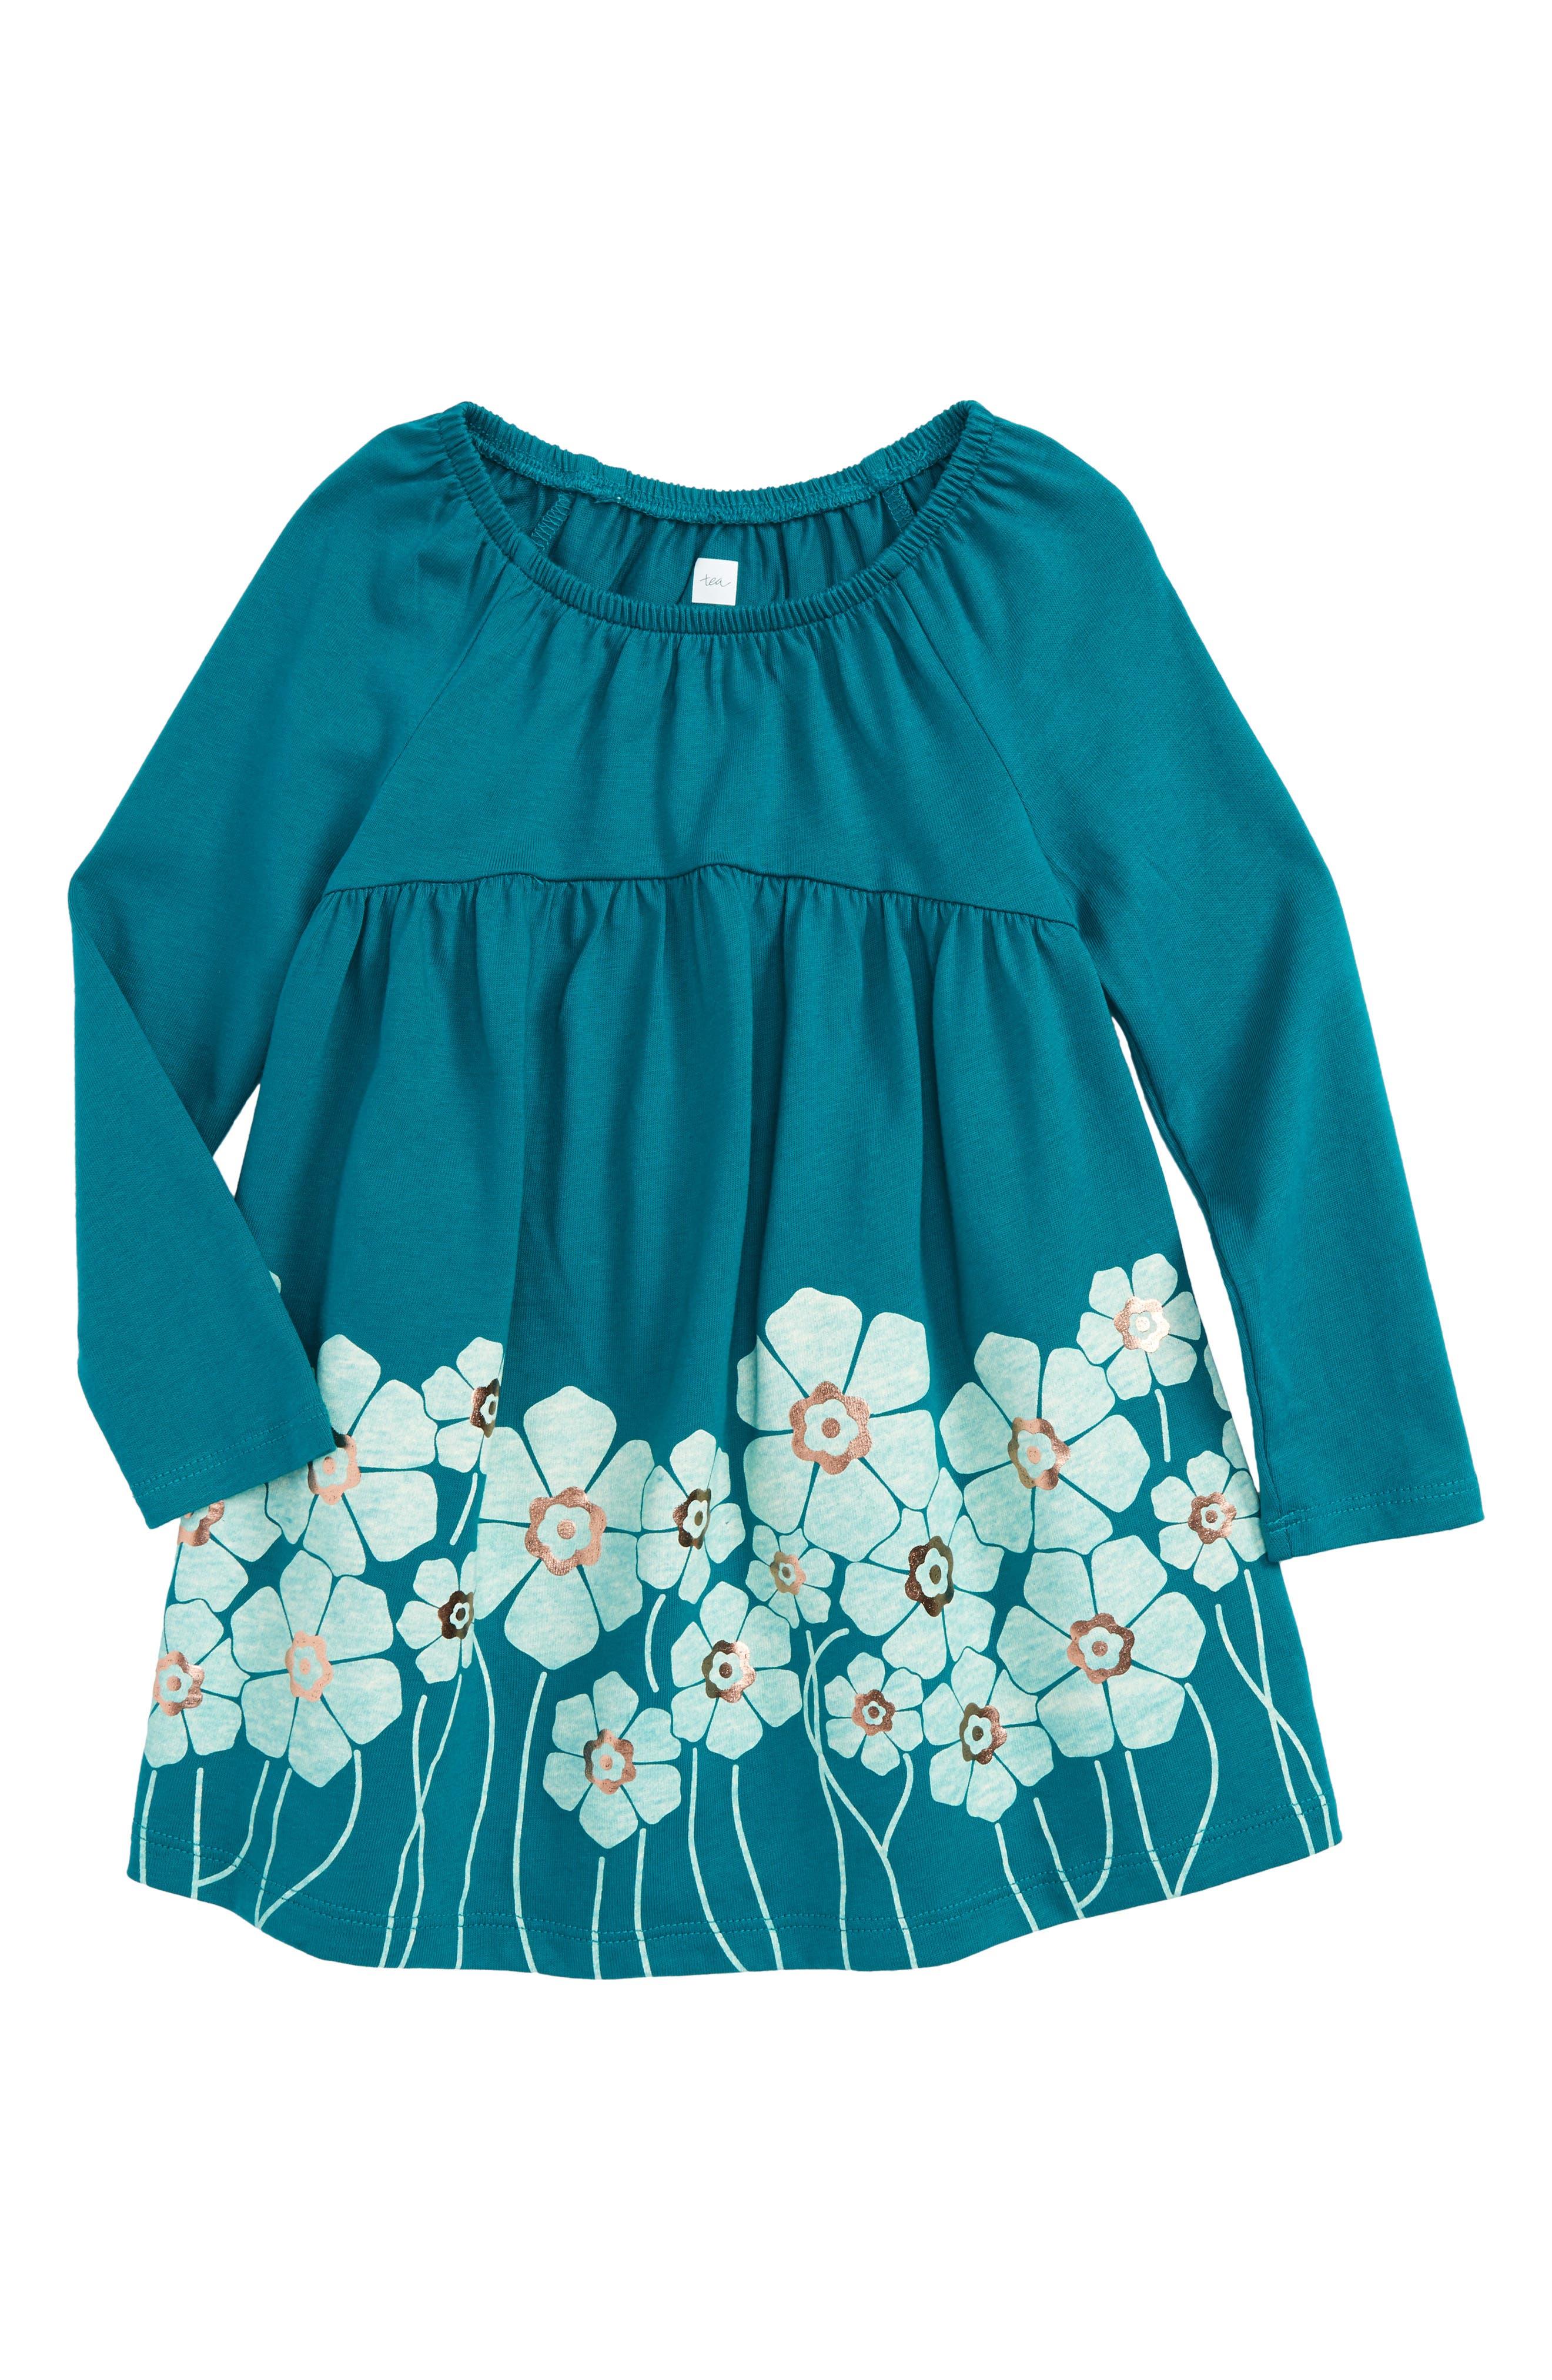 Hatton Dress,                         Main,                         color, 447